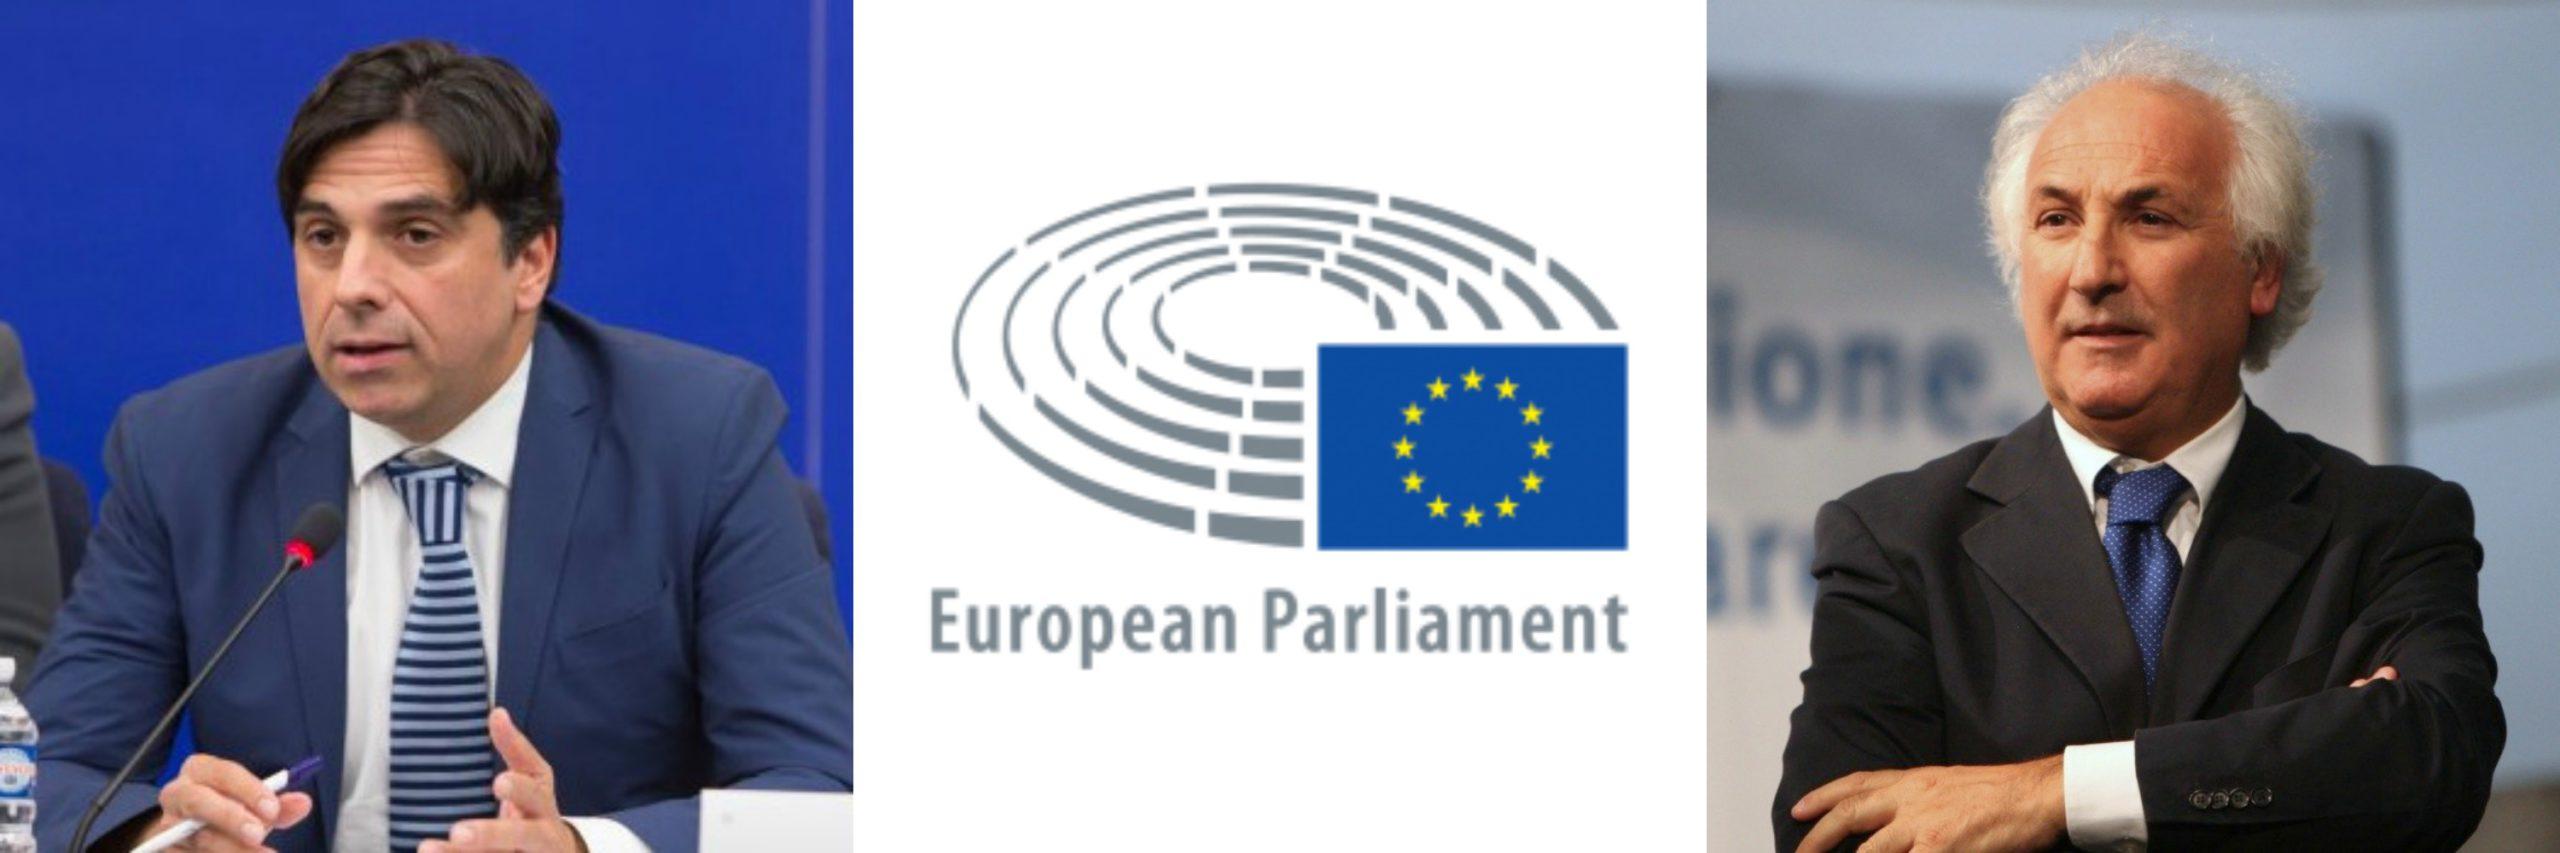 EuropeanParliamentCollage